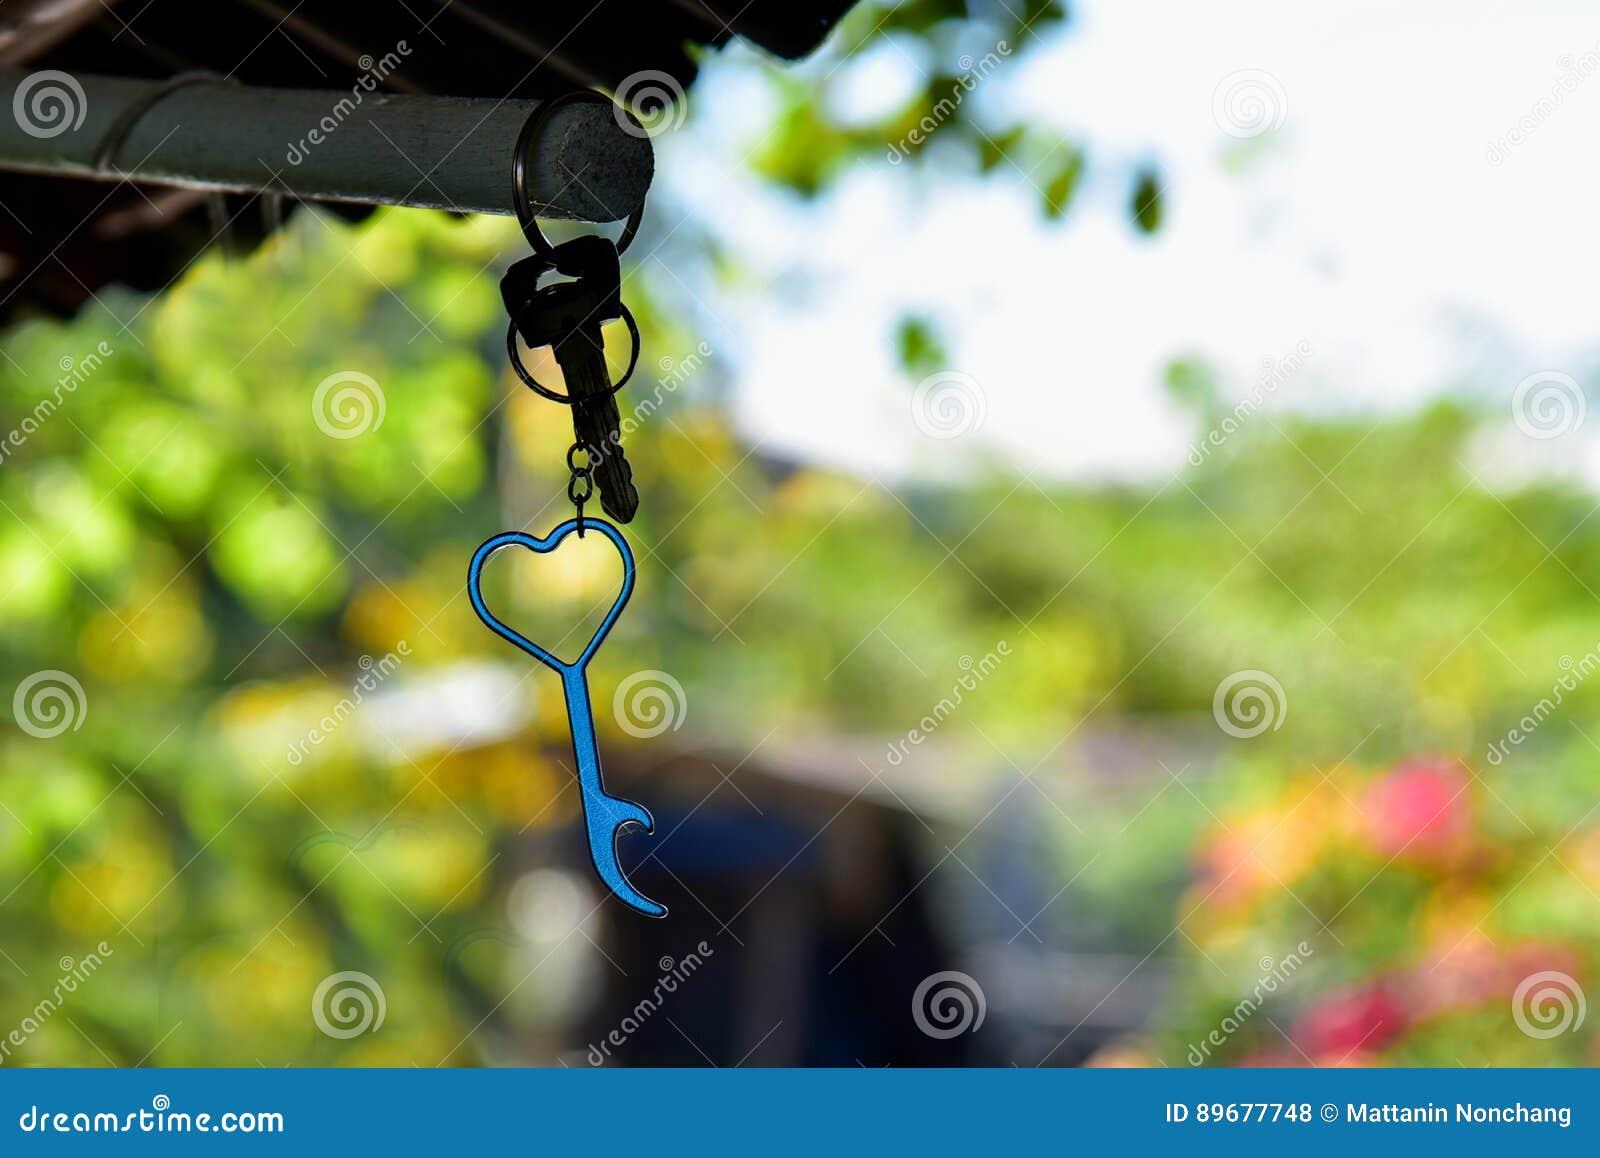 Bottle Opener and key ring